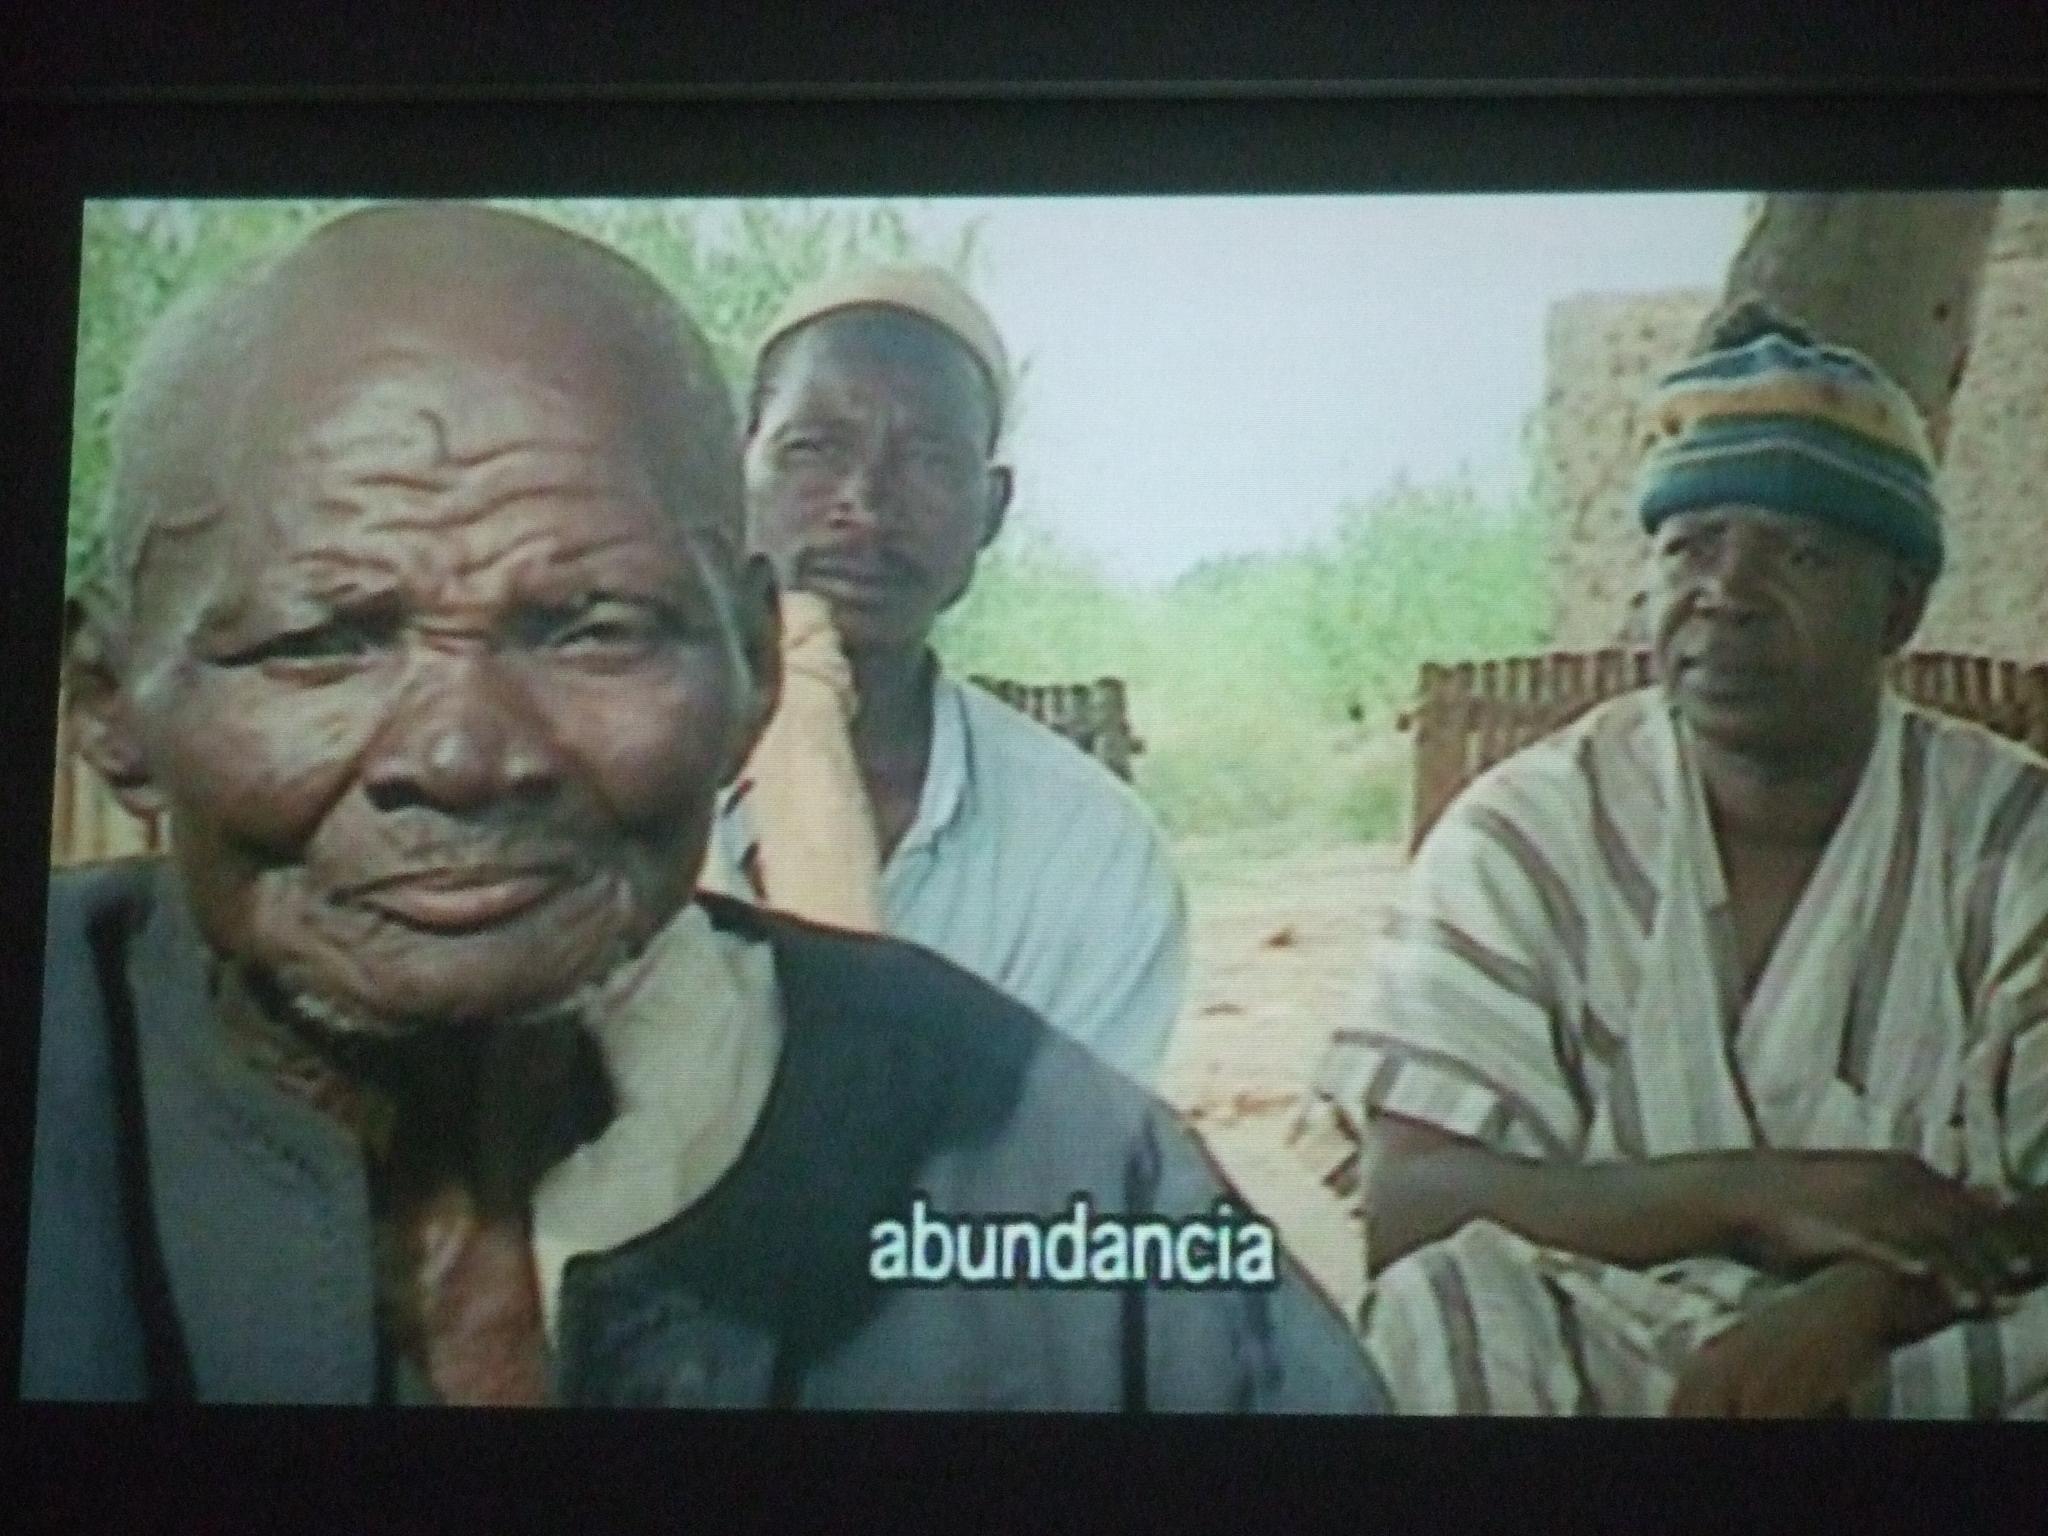 sitio web africano besando